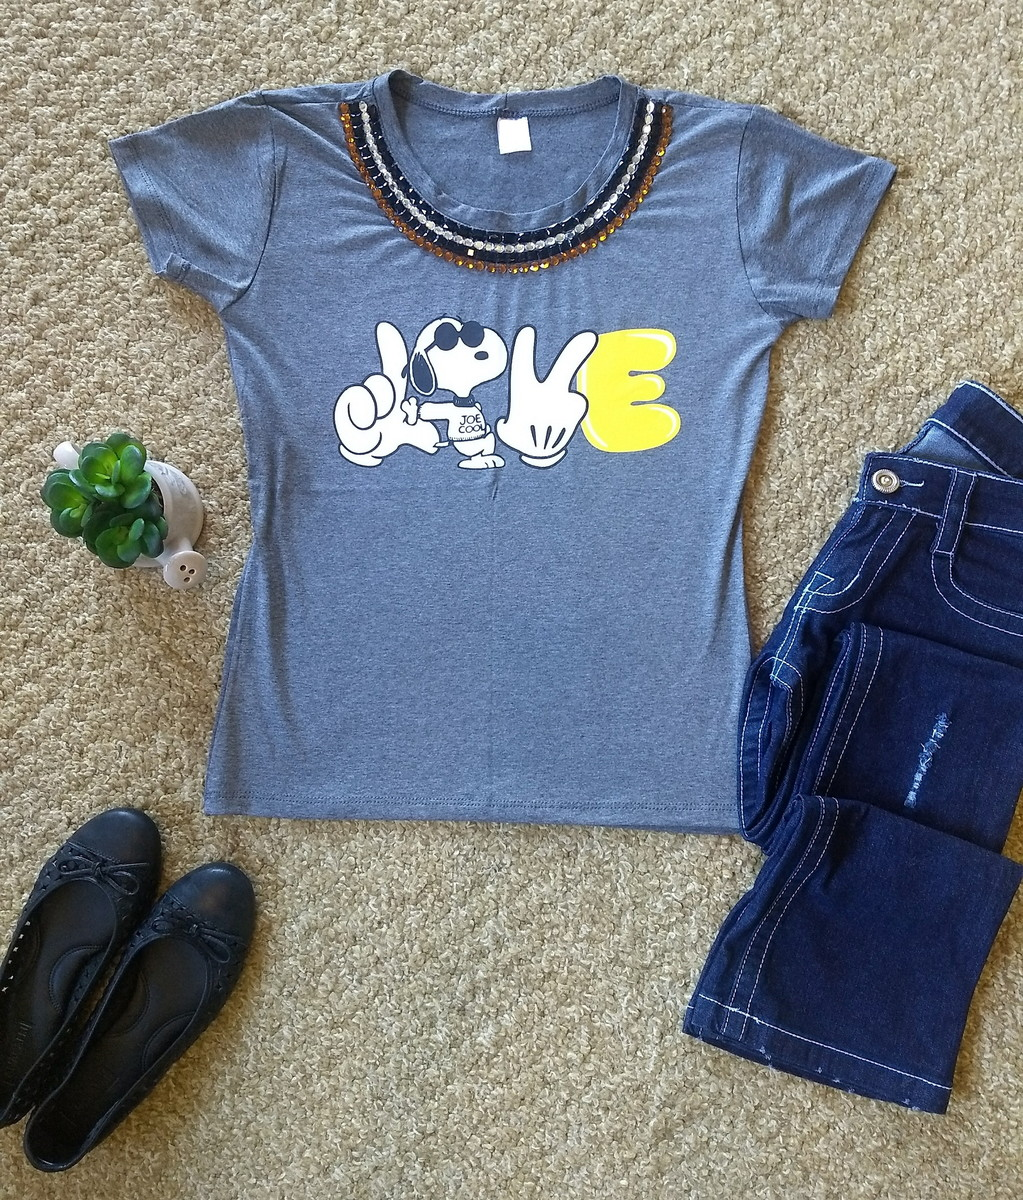 841132f44f Camiseta bordada Love Snoopy no Elo7